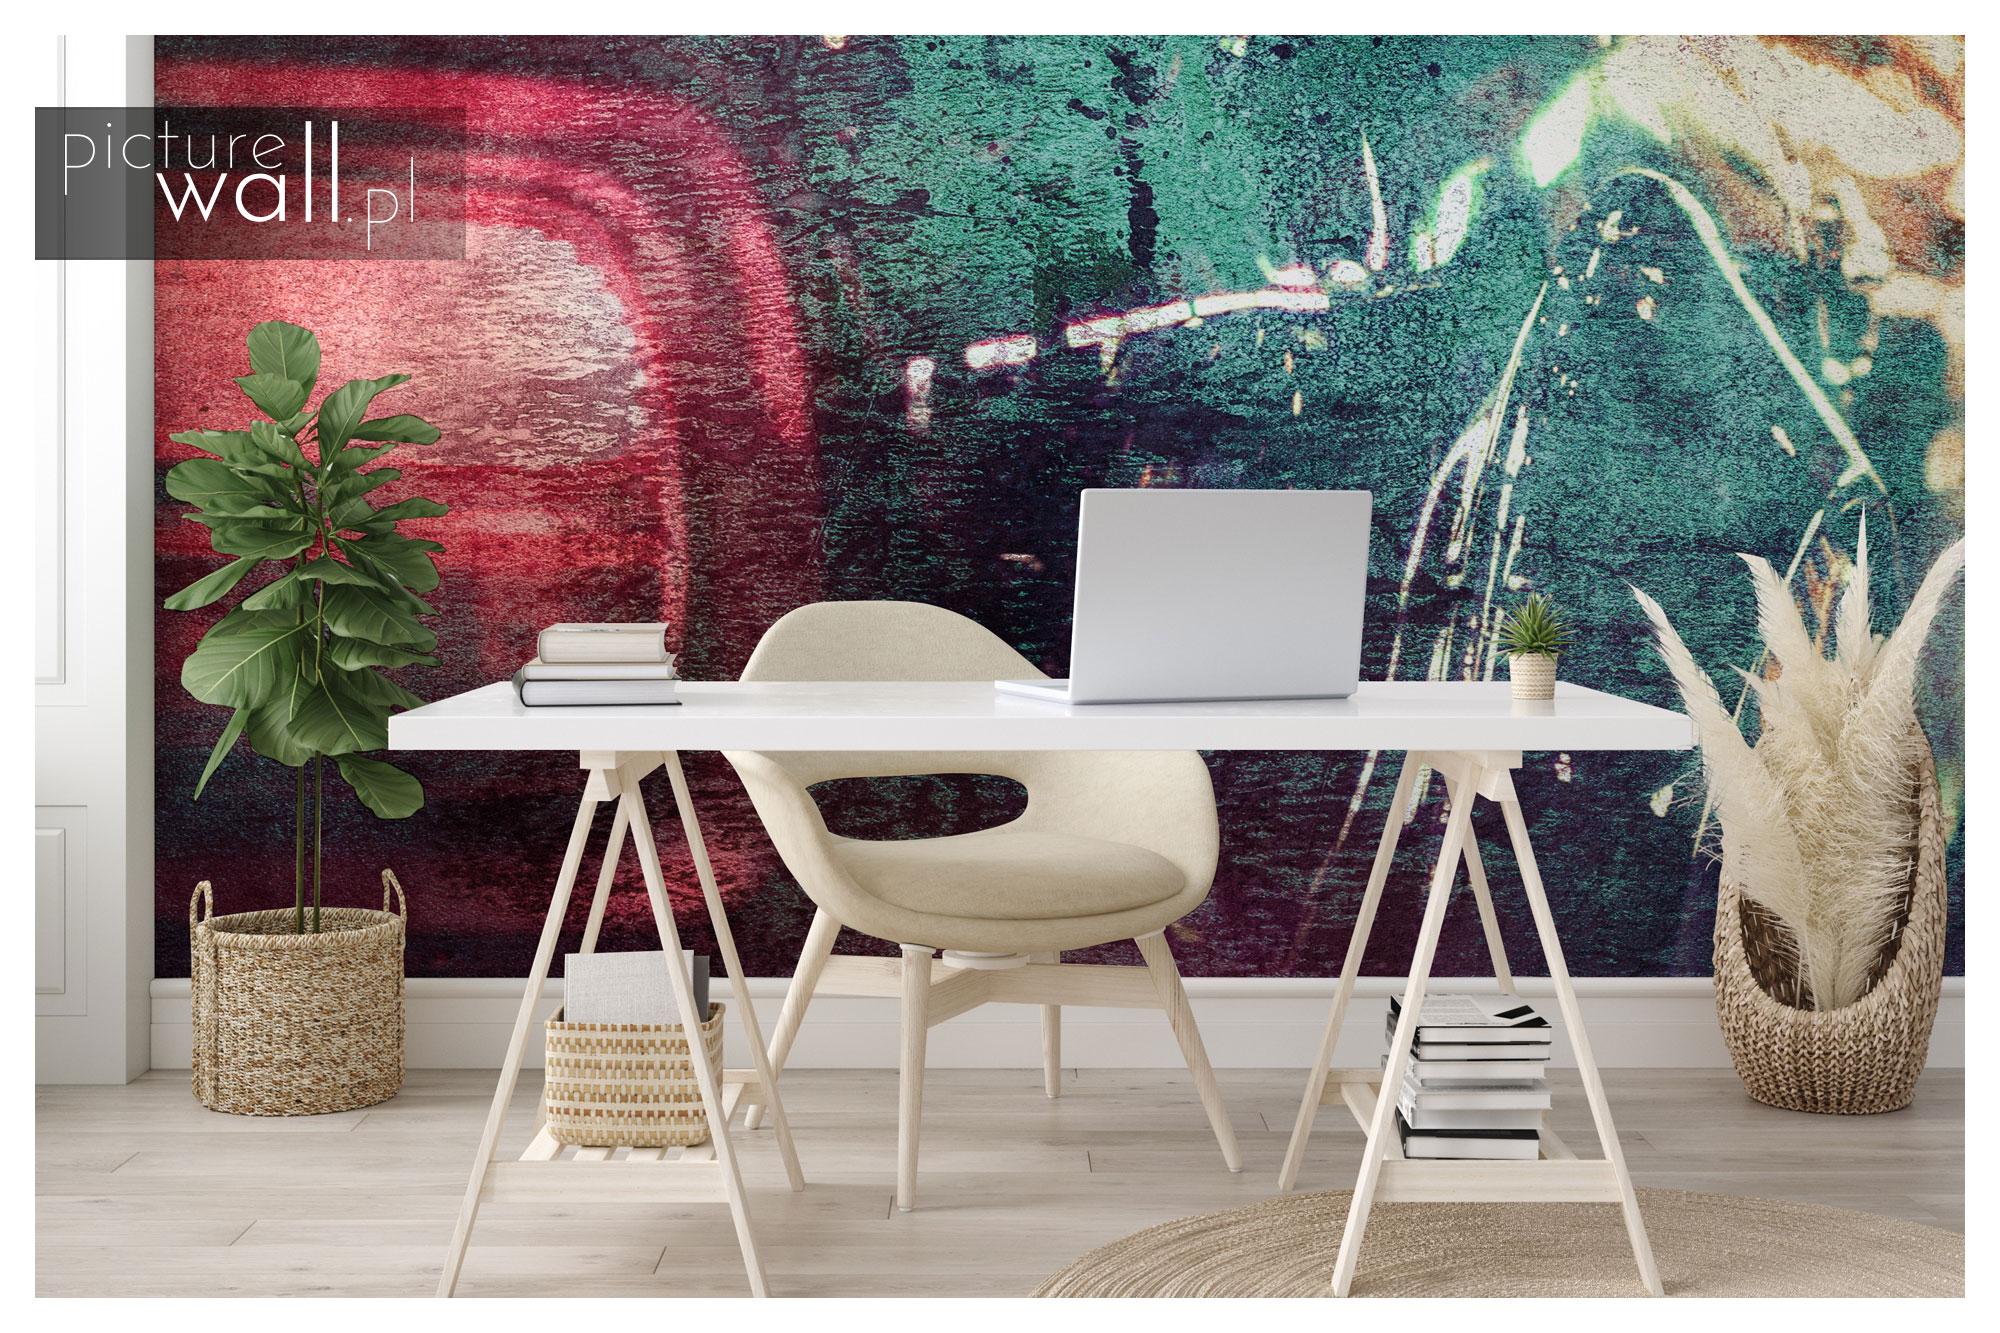 Fototapeta autorska Neonowe Grafffiti w home office